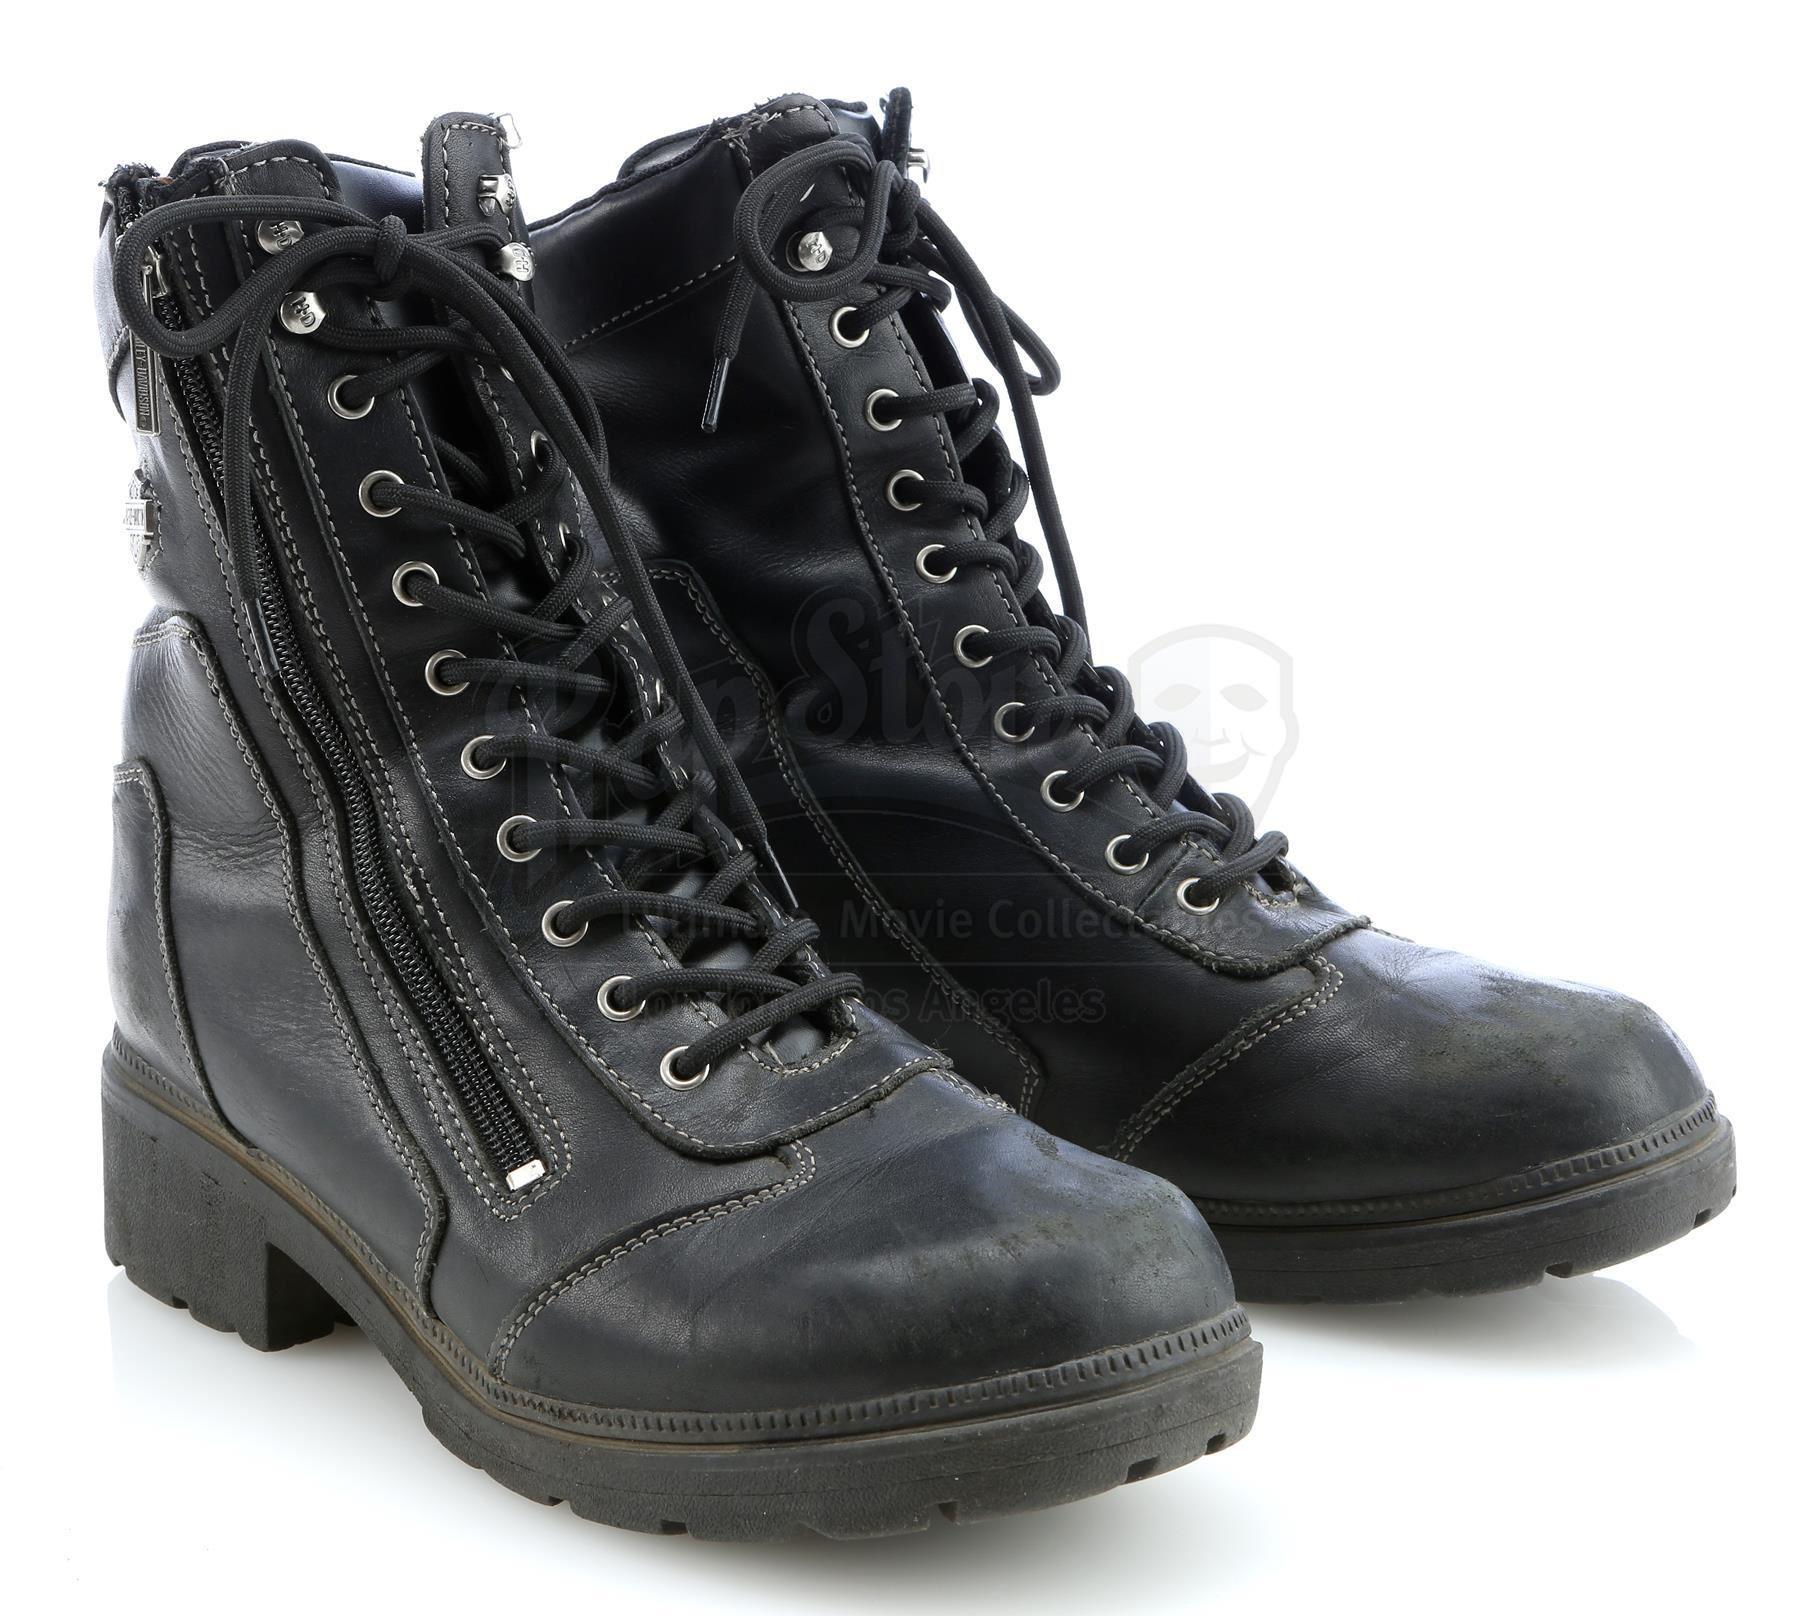 460b034b66f Gemma Teller Morrow's (Katey Sagal) Death Scene Motorcycle Boots - SONS OF  ANARCHY (2008 - 2014)